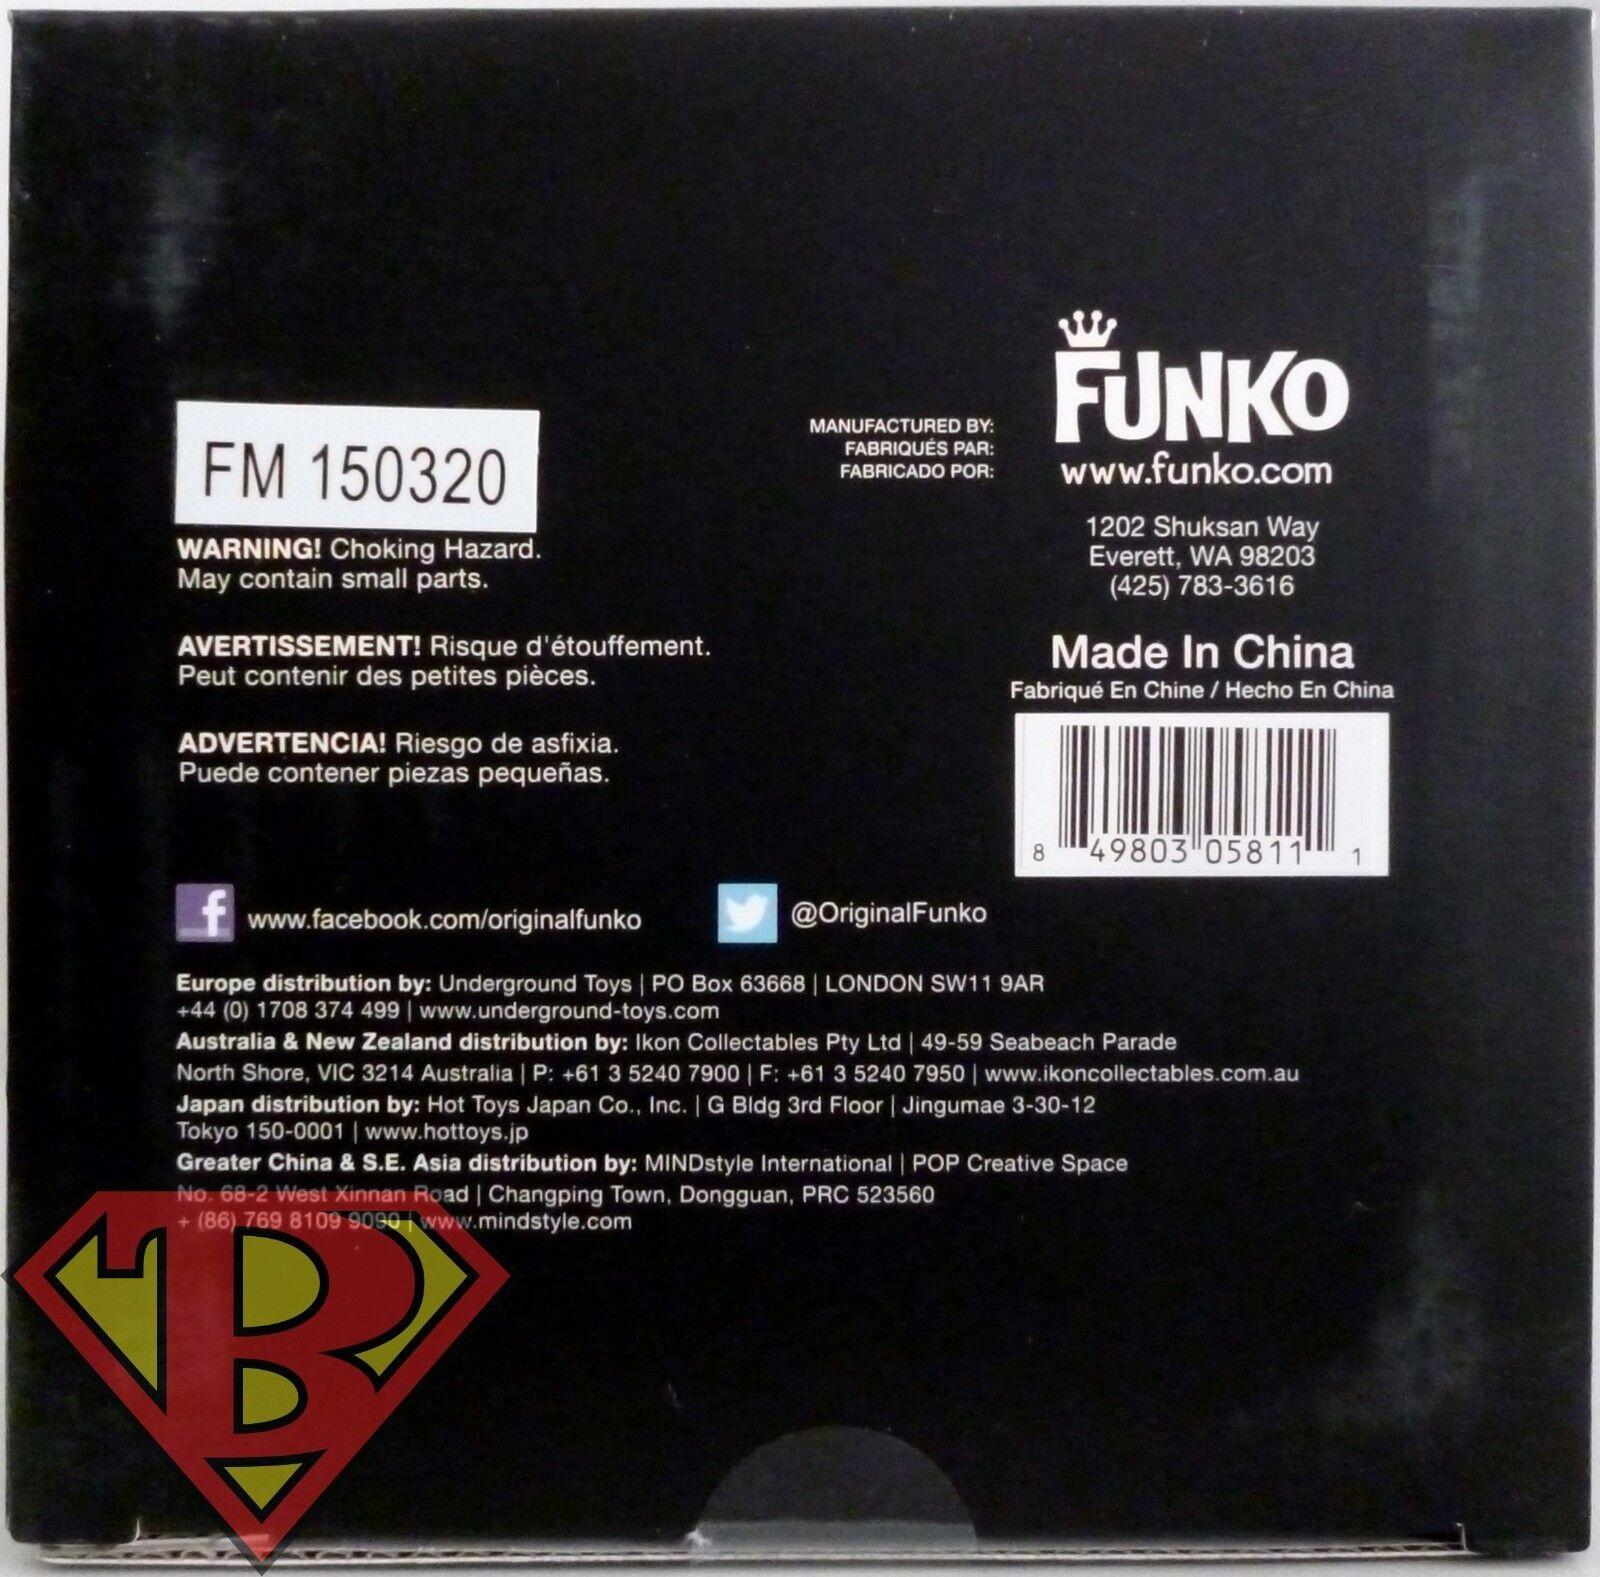 DEADPOOL Marvel Hikari Hikari Hikari Sofubi Japanese Vinyl 8  inch Figure  'd  750 Funko 2015 8394e5